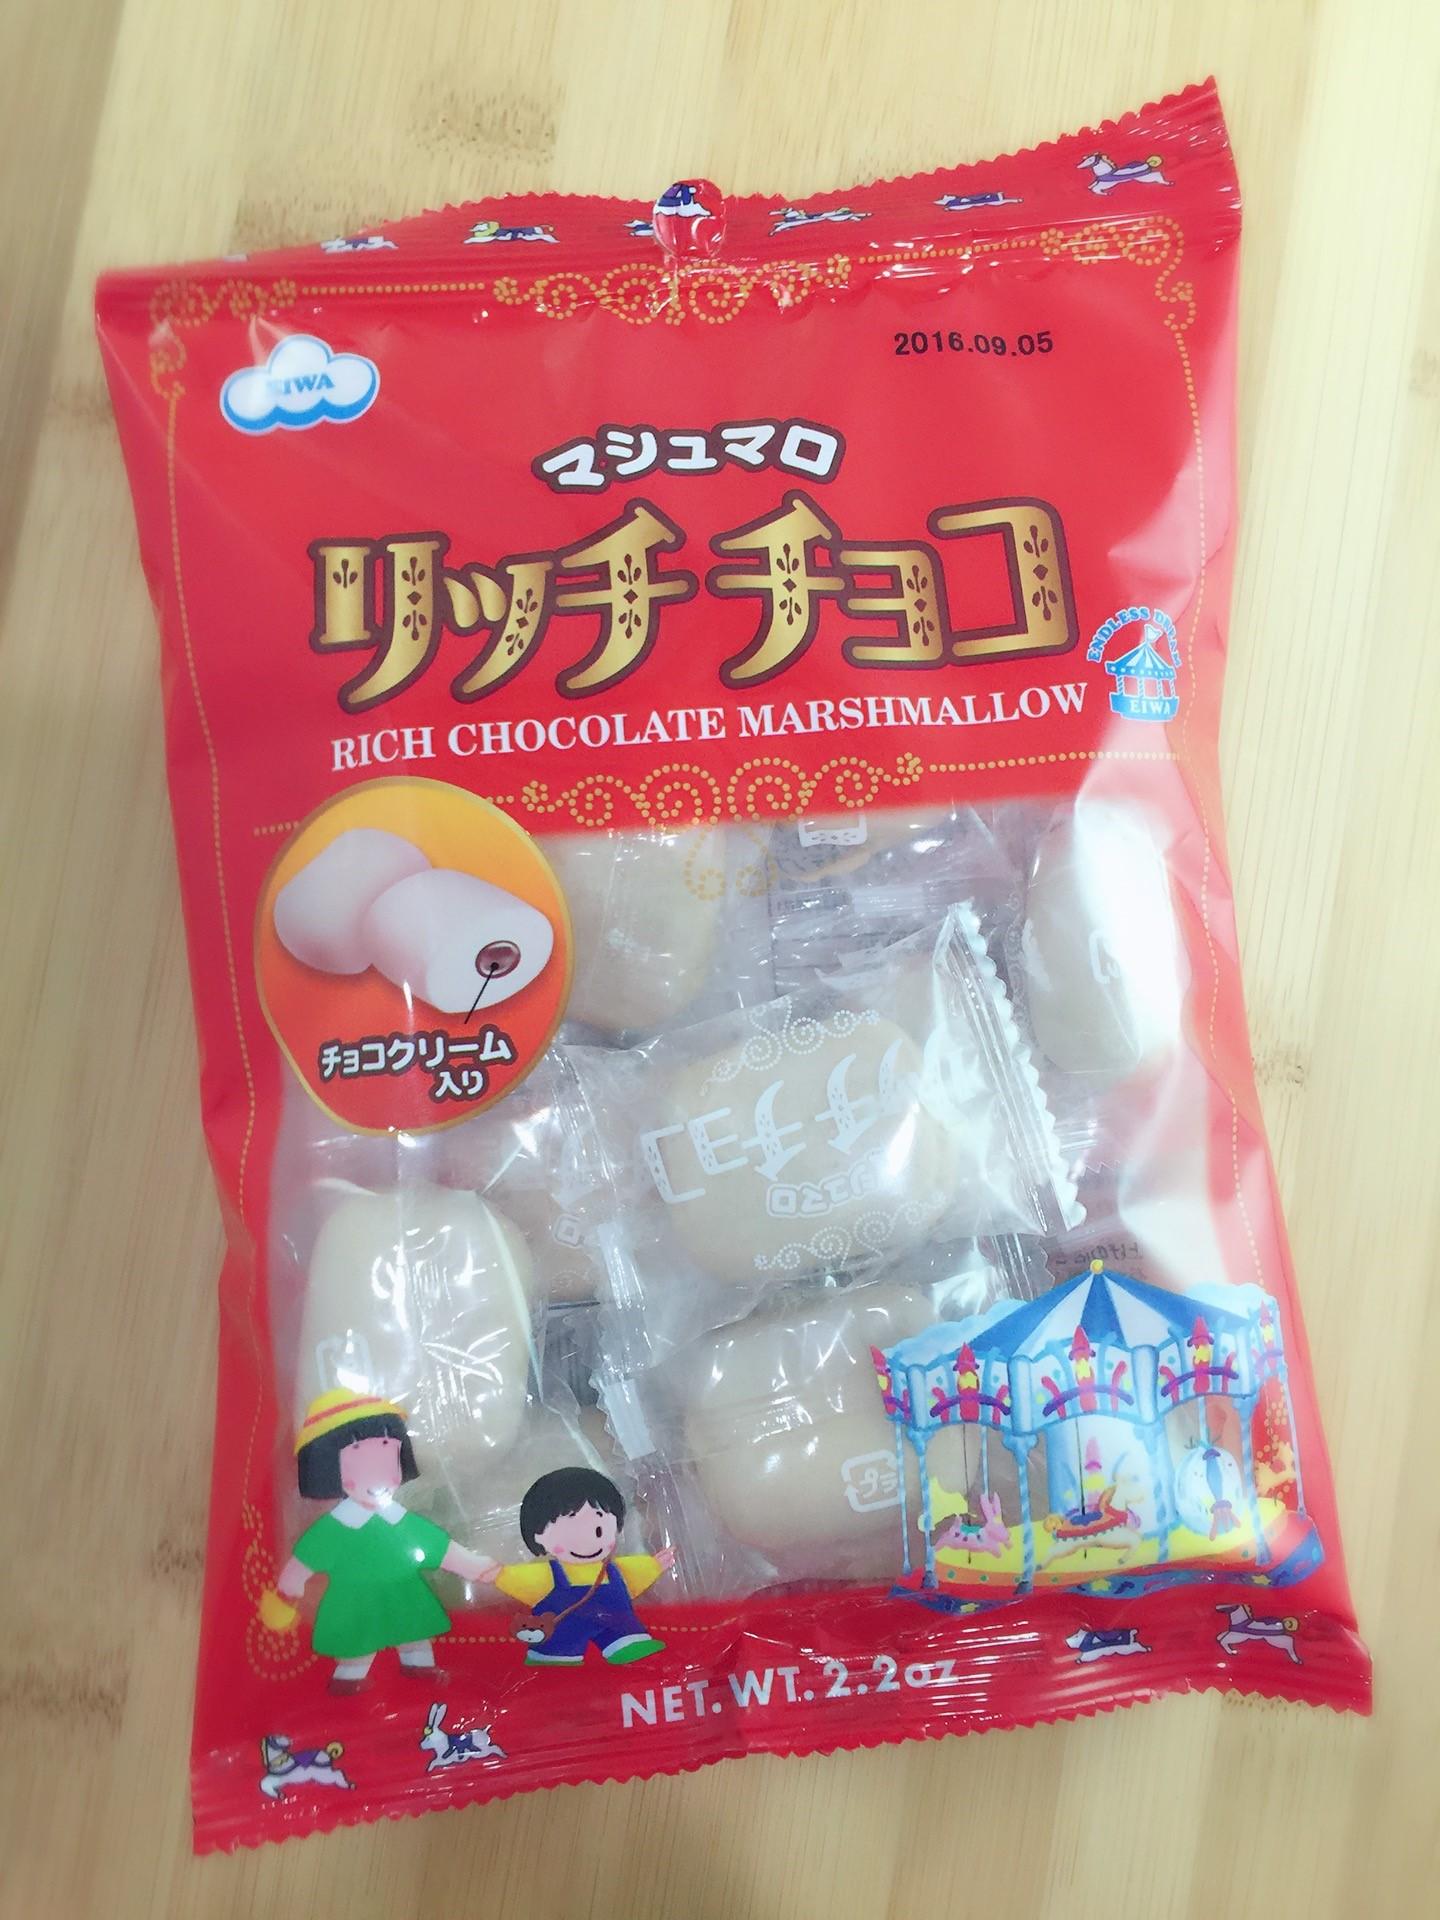 【Kizandy】Eiwa 伊華 巧克力棉花糖